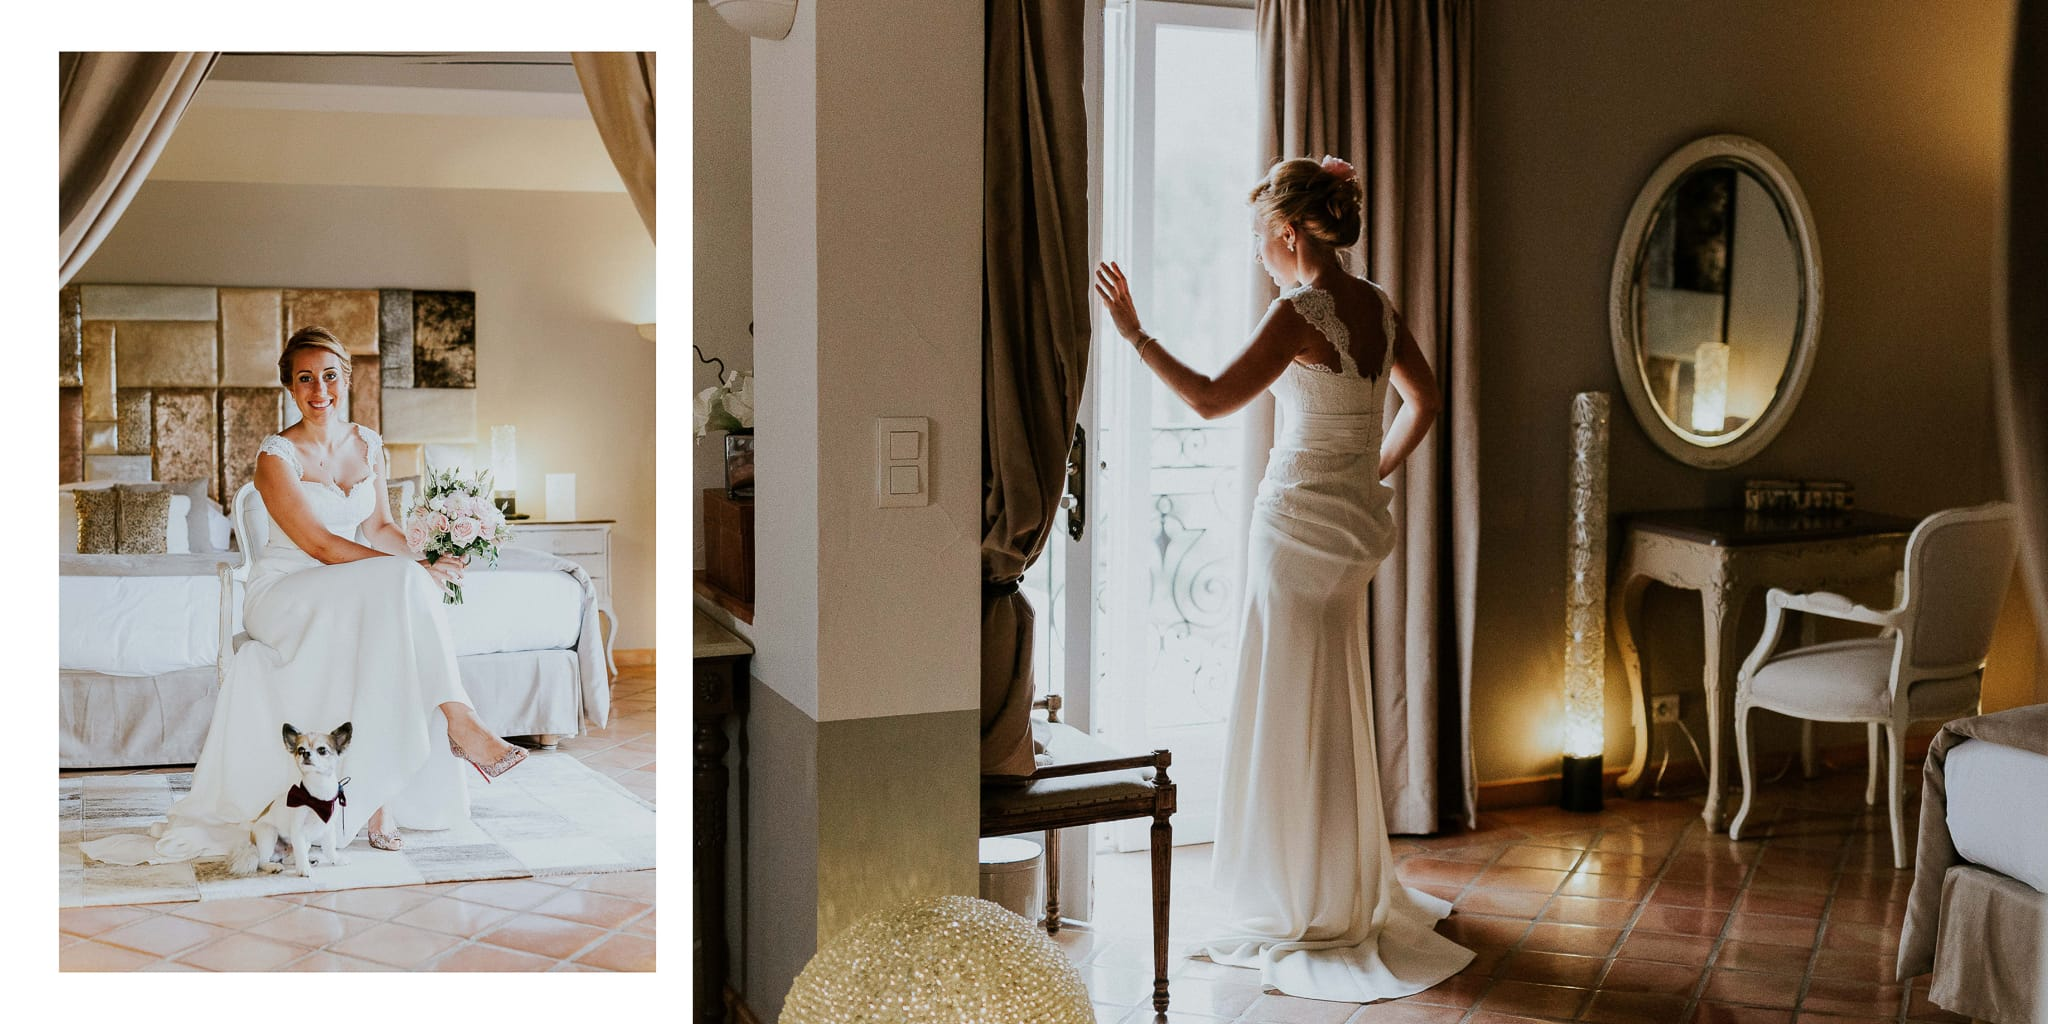 Costi-Moiceanu-Photographer-CM-Photography-Wedding-Mariage-French-Riviera-Cote-D-Azur-Alpes-Maritimes-Weding-Album-Design-7